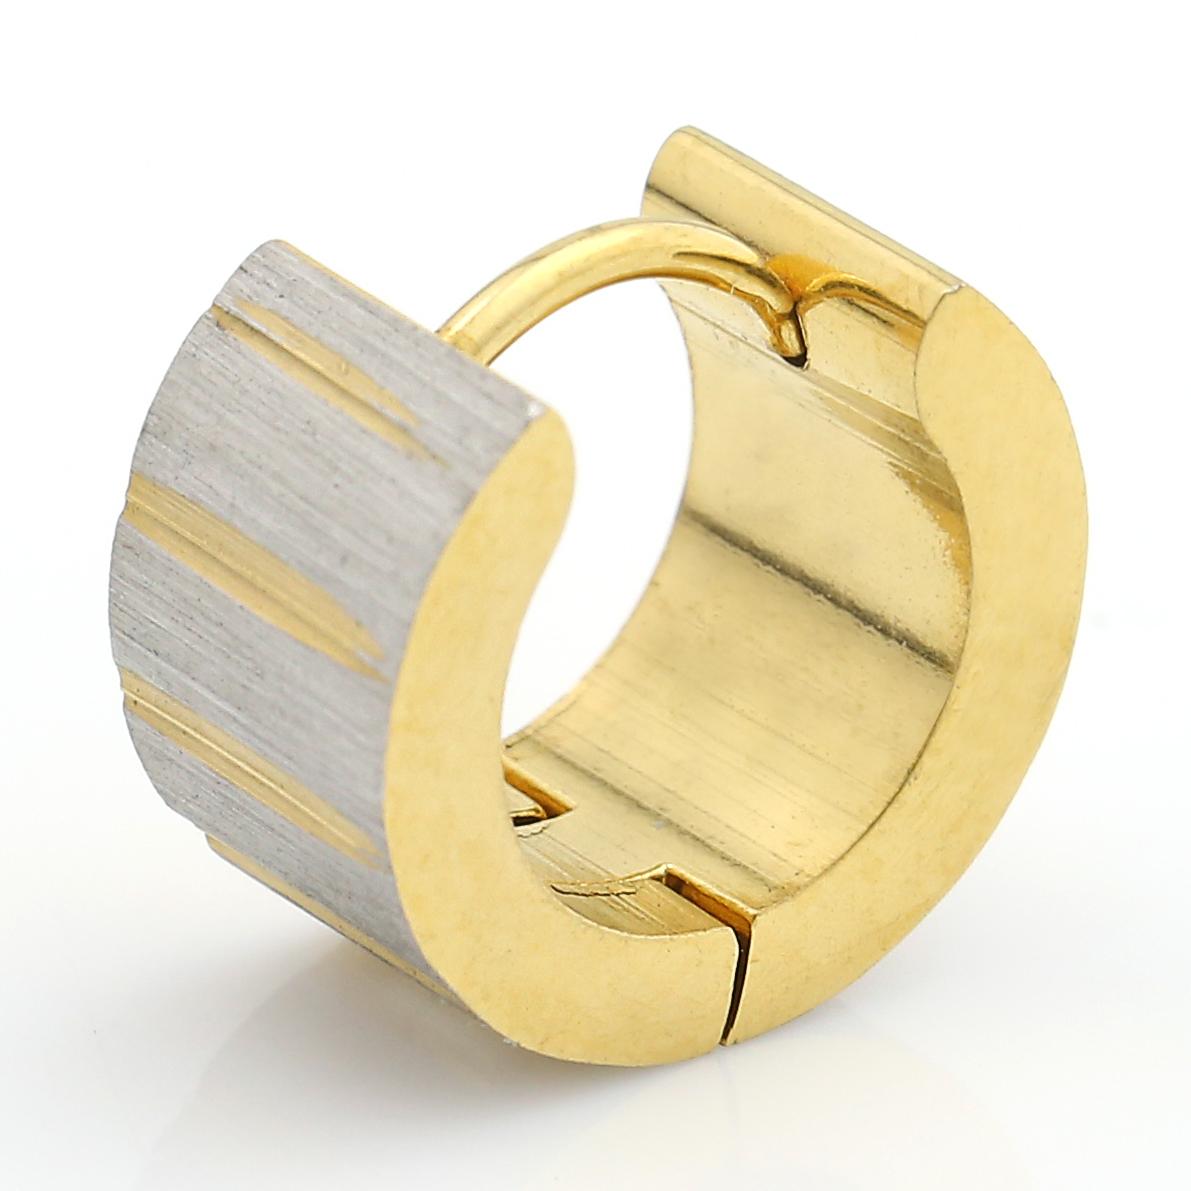 UNITED ELEGANCE Stylish Two Tone (Silver & Gold Tone) Huggie Hoop Earrings image 4